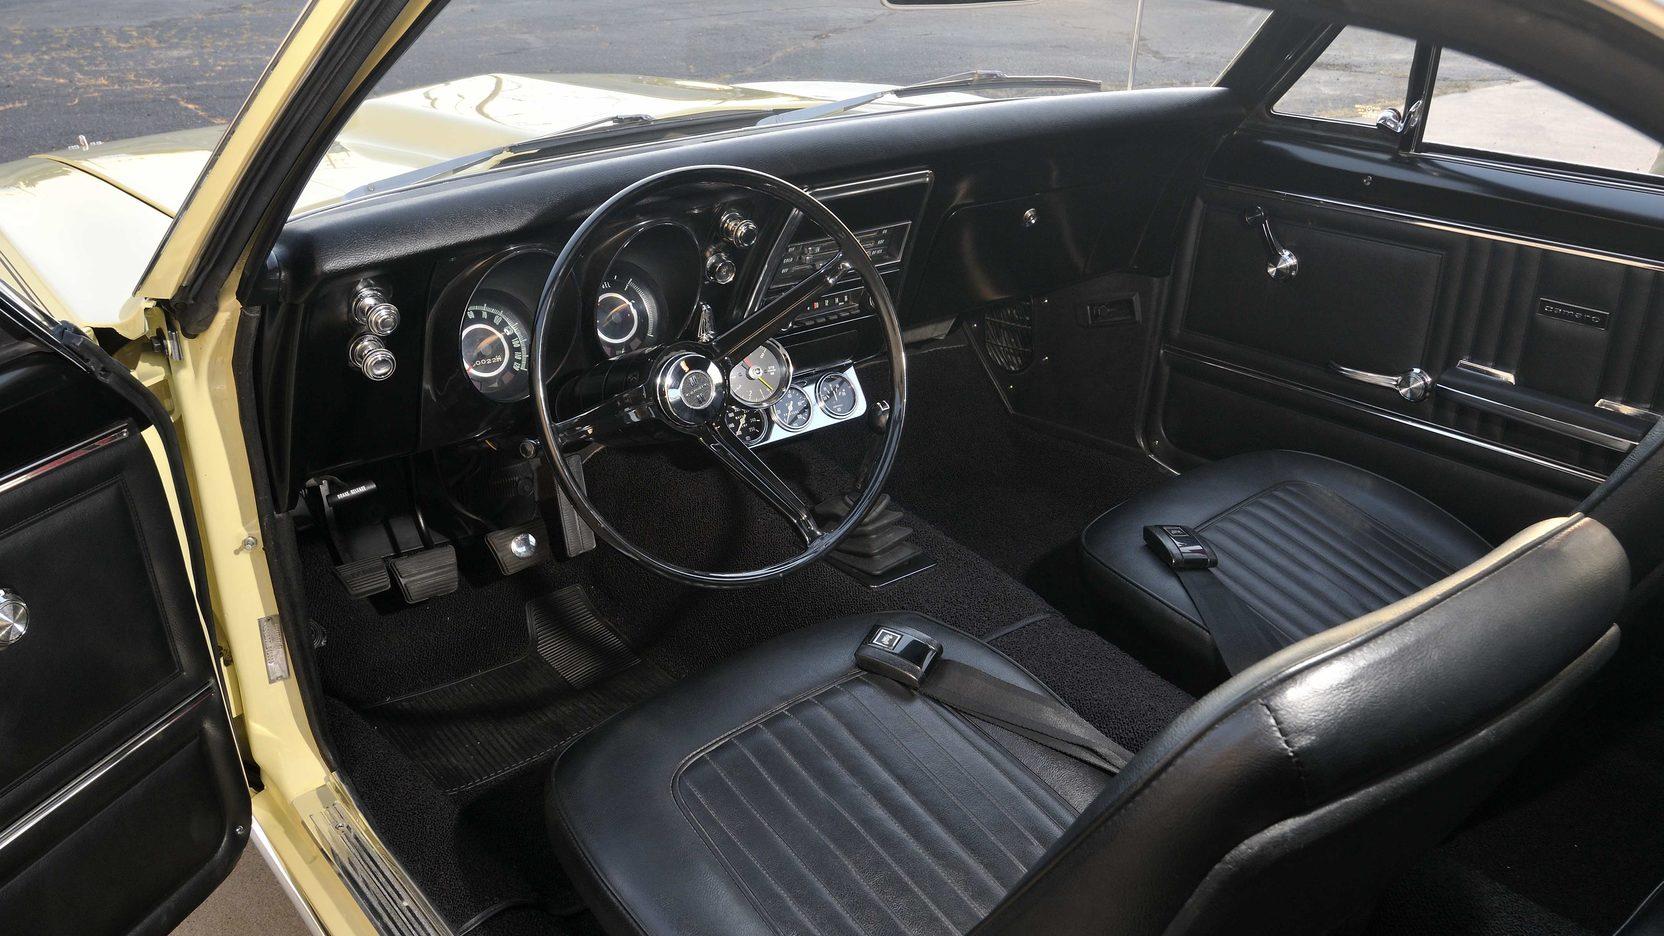 1967 Yenko Chevrolet Camaro Interior